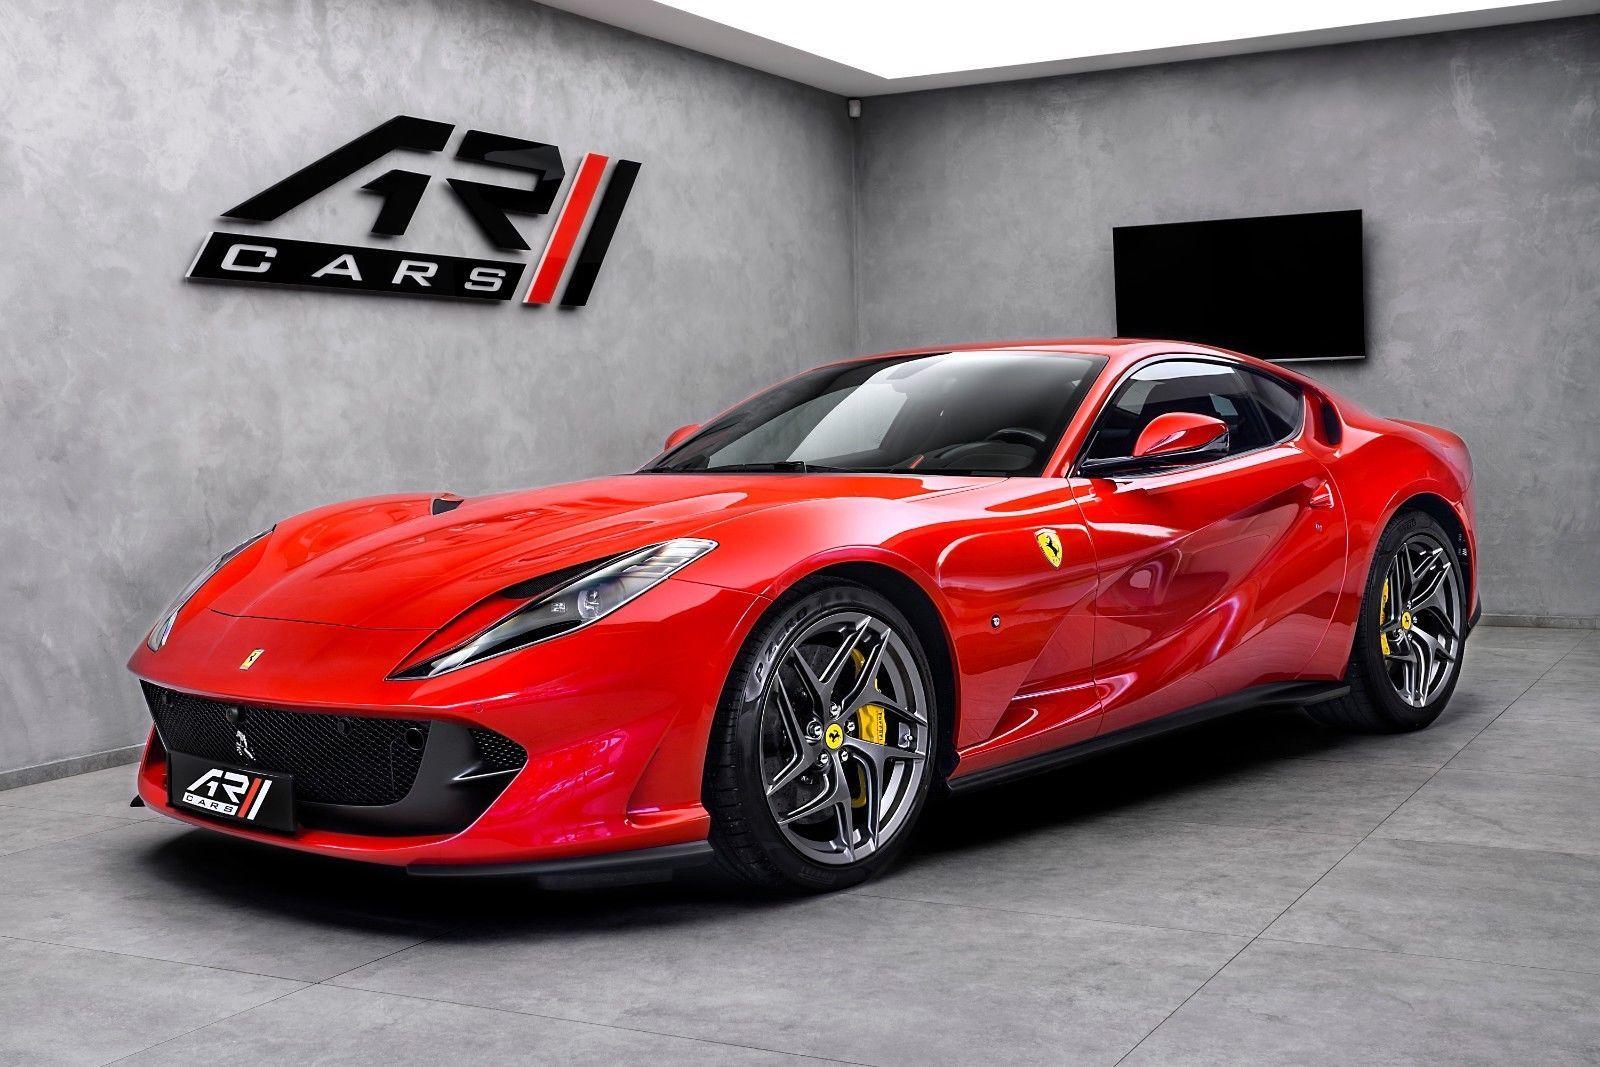 Ferrari 812 Superfast Luxury Pulse Cars Czechia For Sale On Luxurypulse In 2020 Super Cars Ferrari Ferrari Car